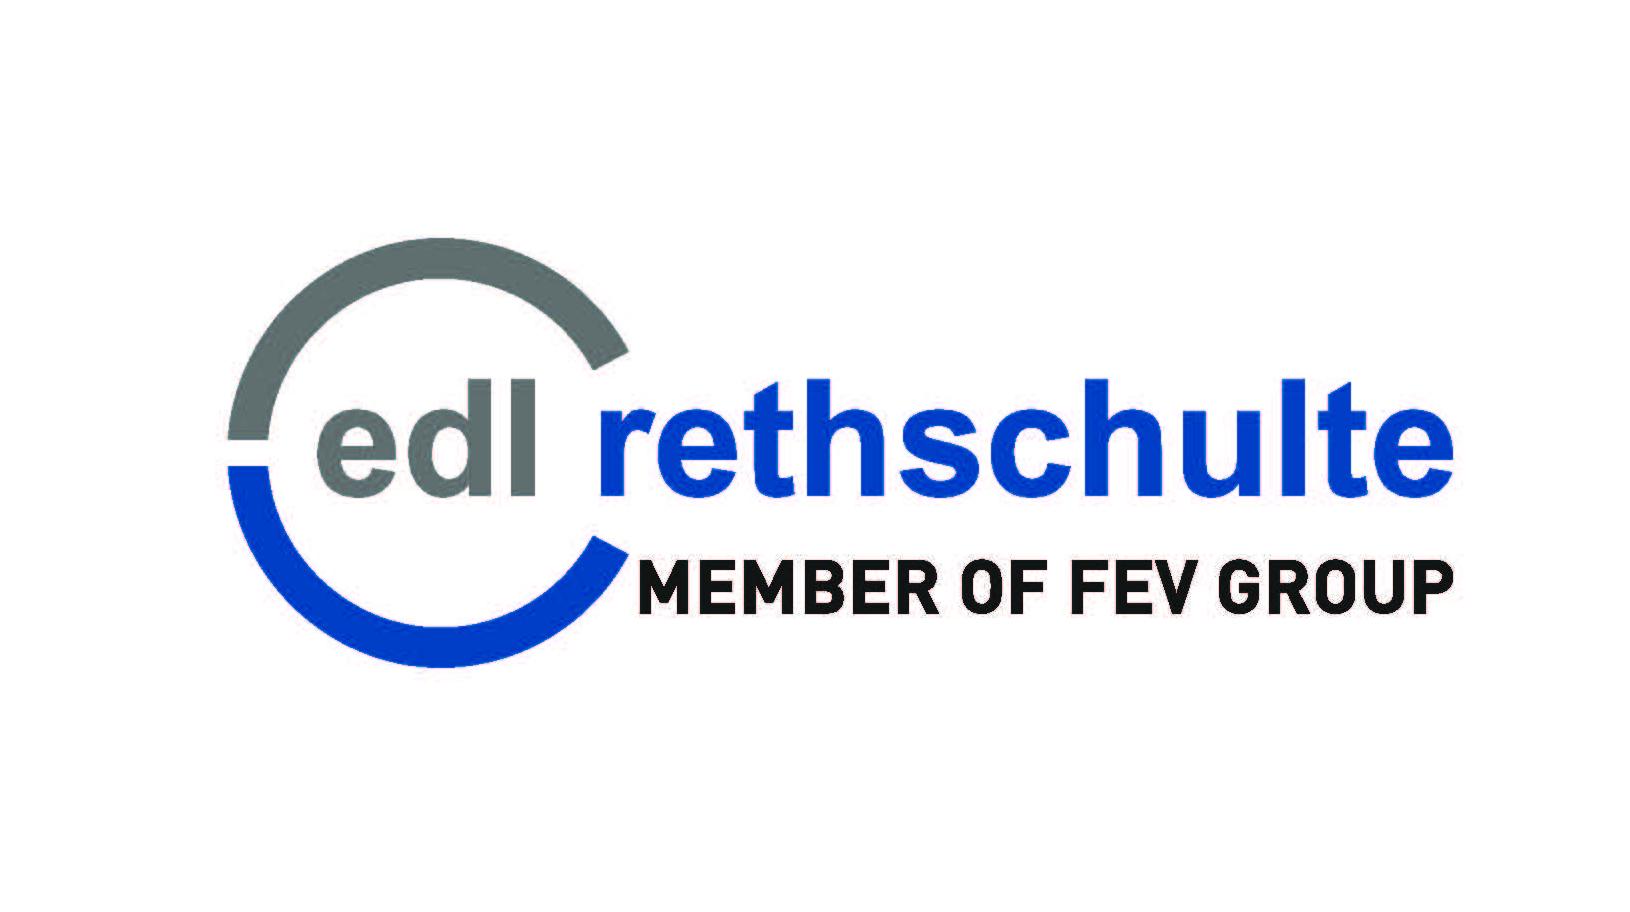 EDL-RETHSCHULTE